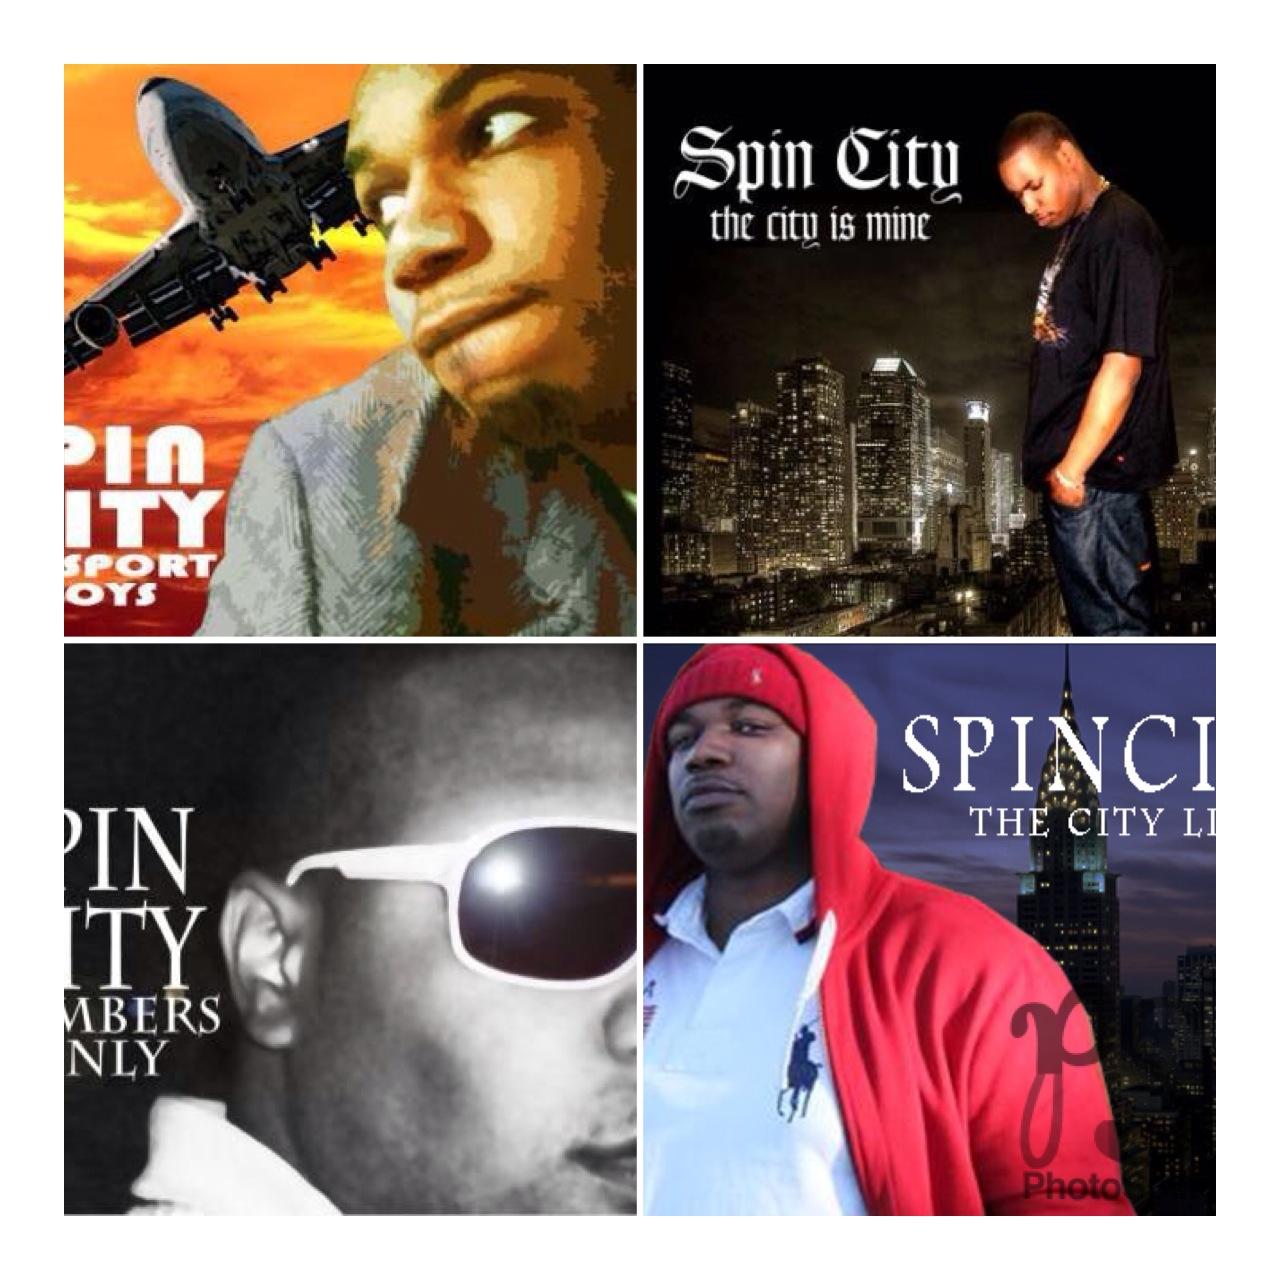 http://2.bp.blogspot.com/-D8fZ_e3lBg4/T_uEFYazuzI/AAAAAAAAARI/x6fIt3io9y0/s1600/mixtapes%2Bin%2Bone.JPG